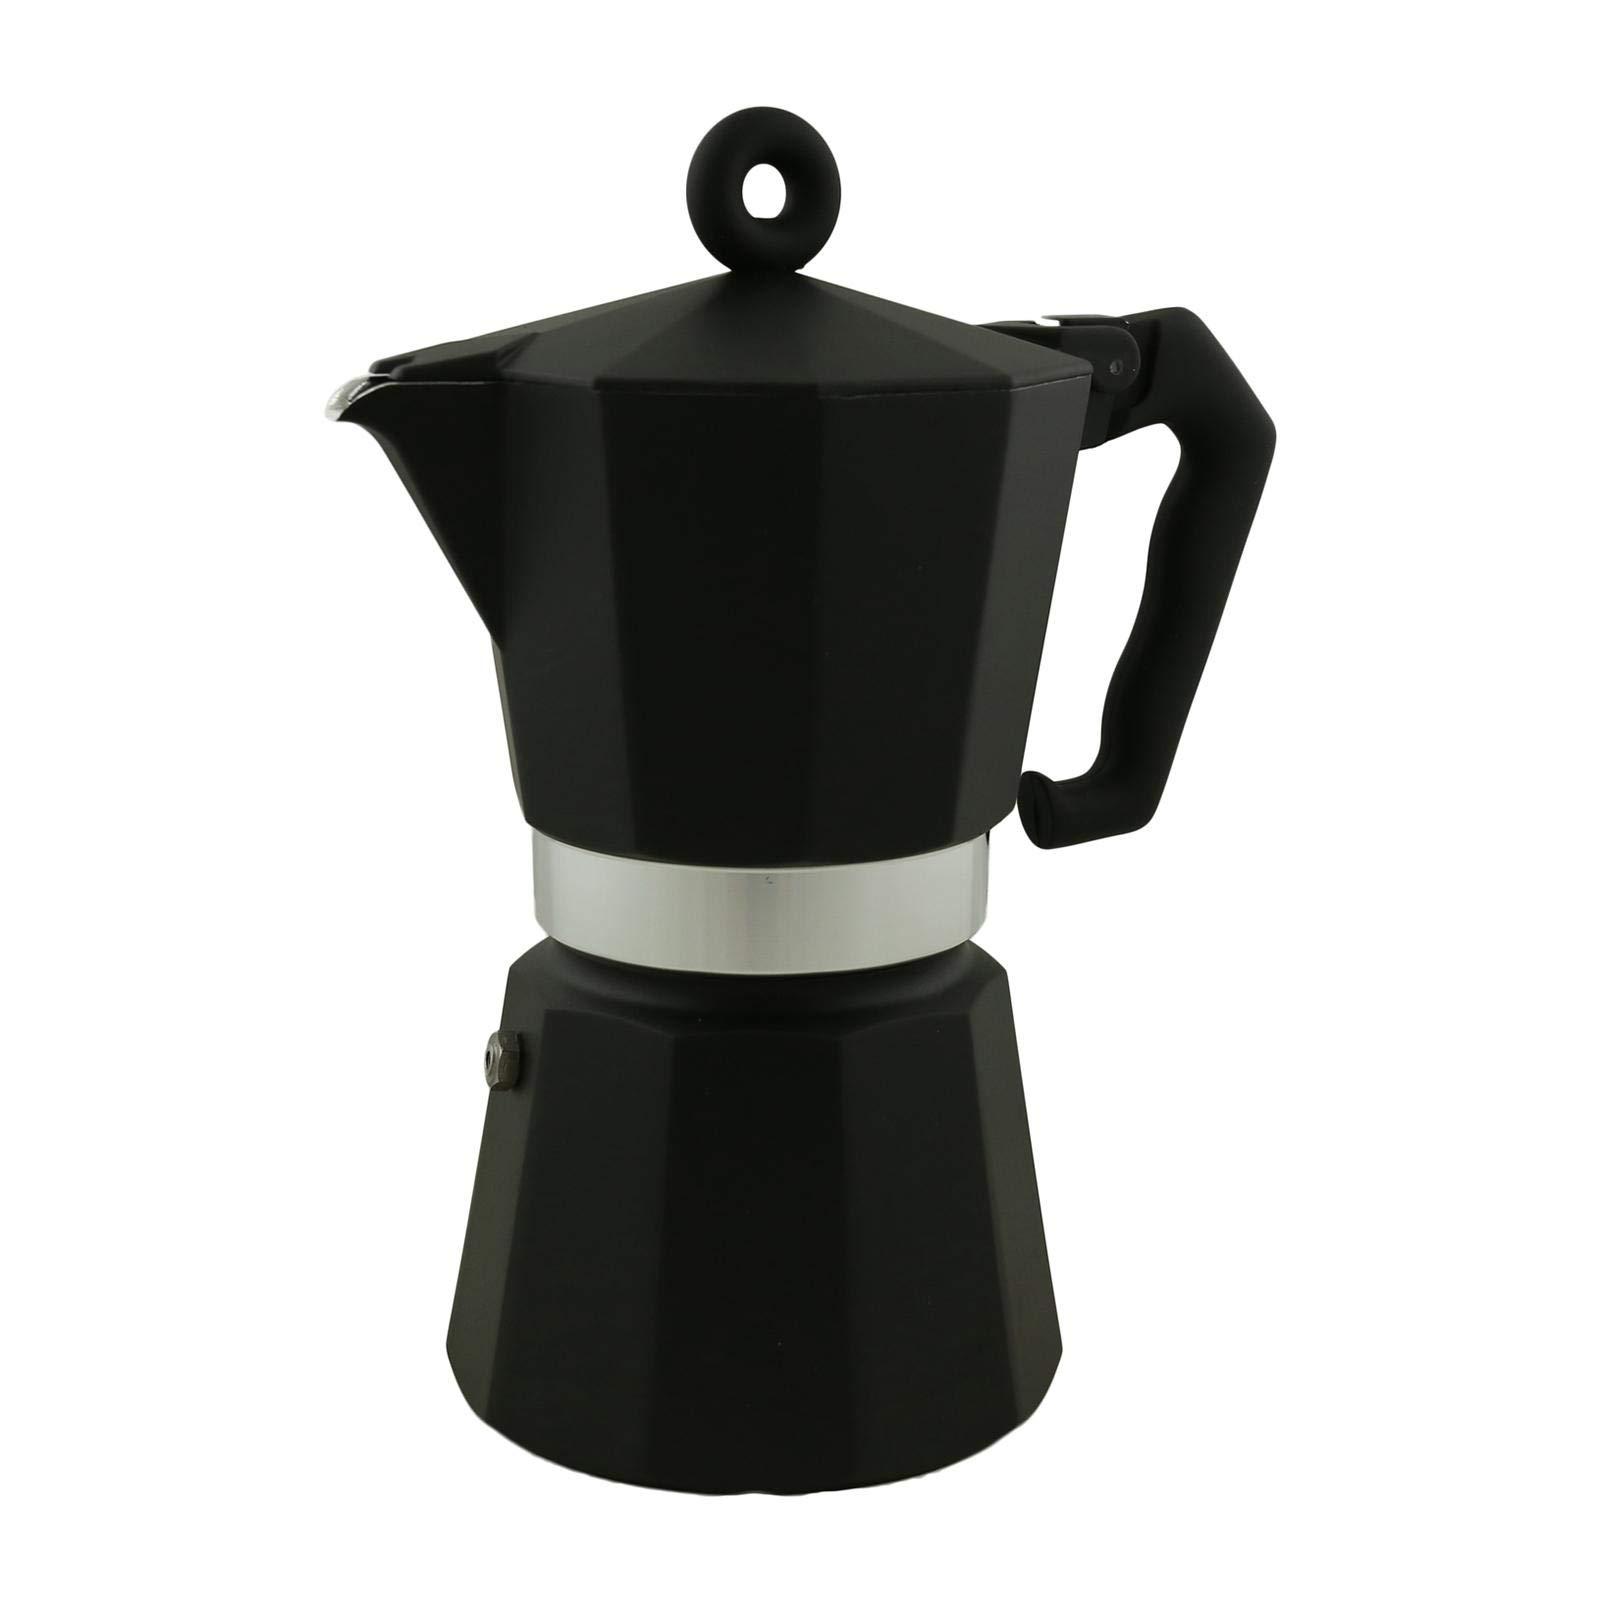 Illy Coffee Moka Pot, 6 CUP, Black